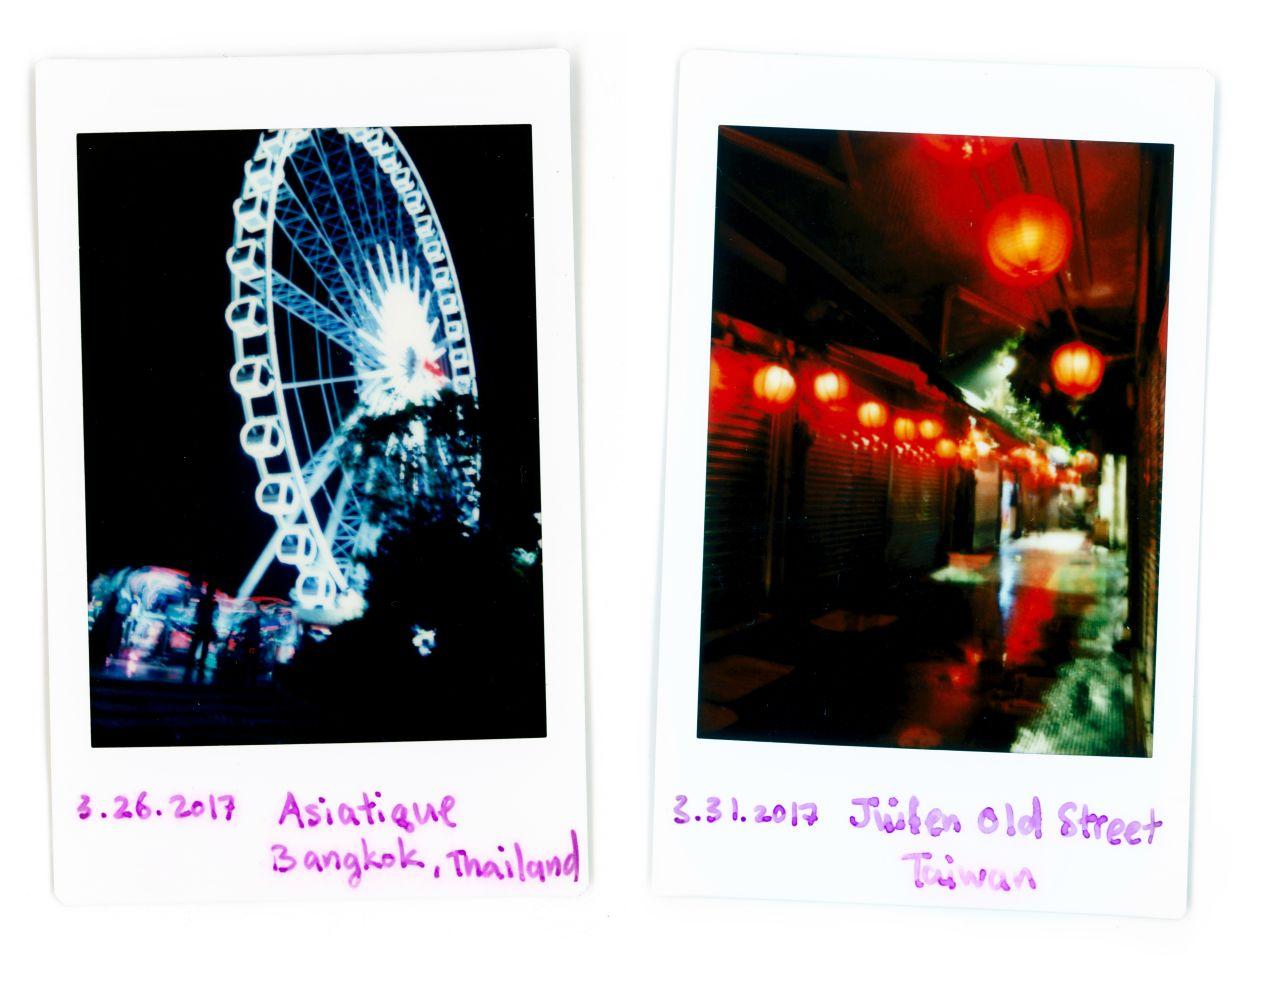 Double exposure + bulb (left). Bulb (right).